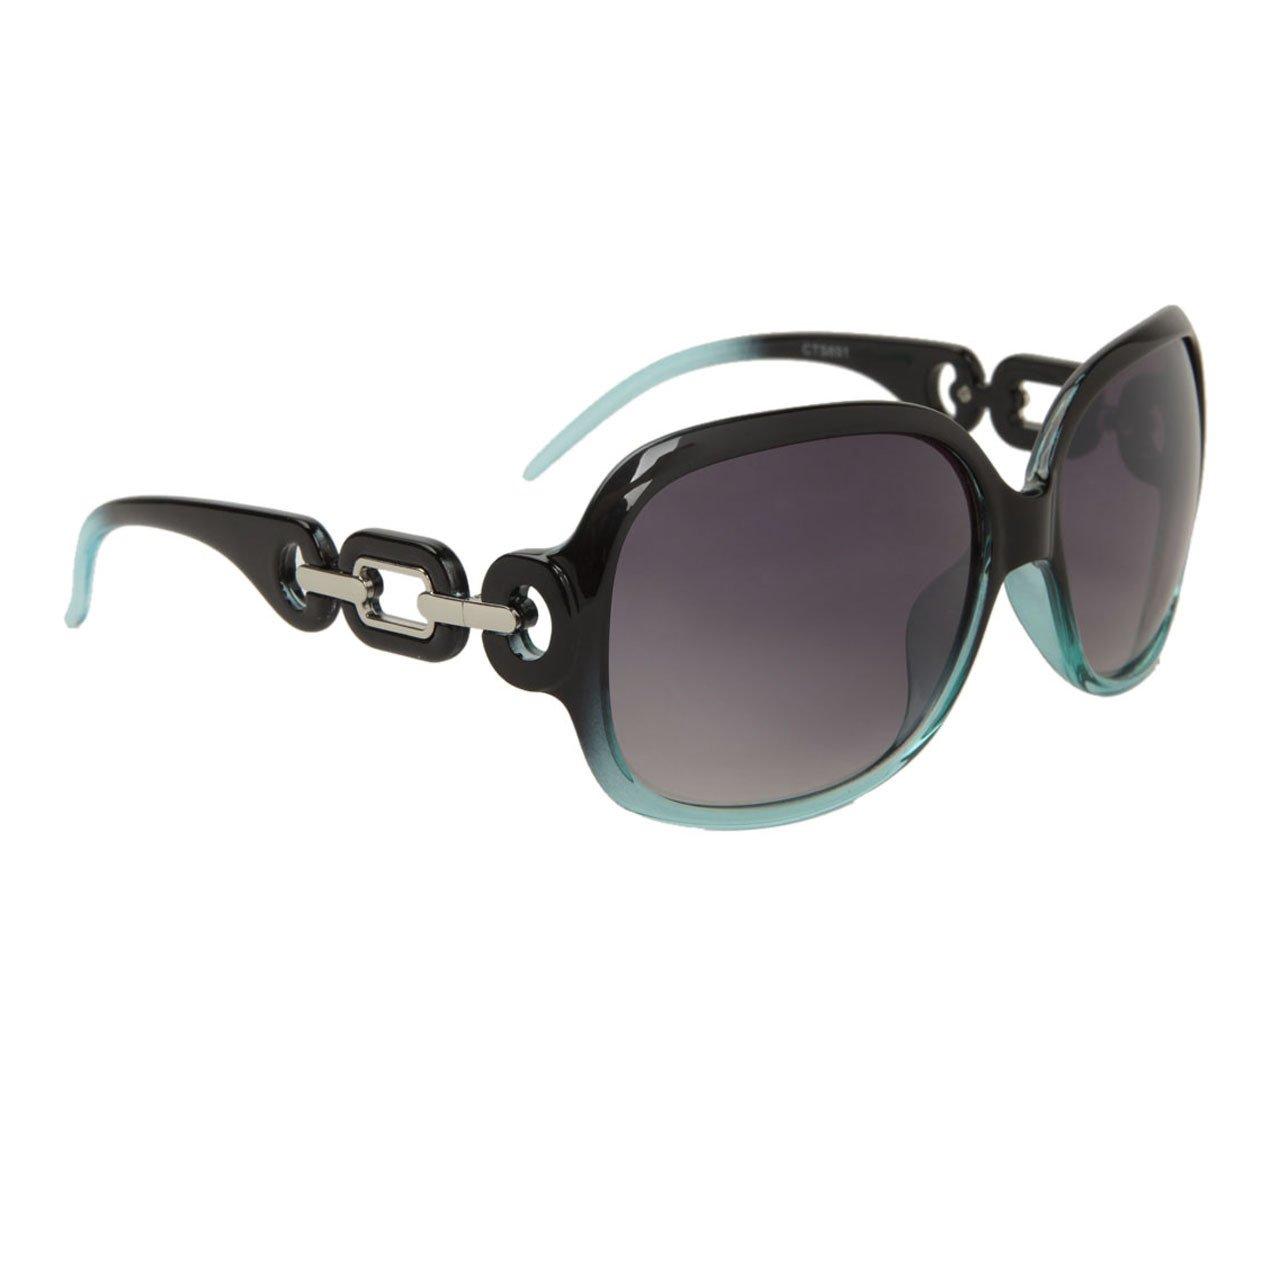 Black Light Blue FancyG/® Womens Fashion Sunglasses Diamond Chain Style Vintage Look UV Protection Eyewear Duotone